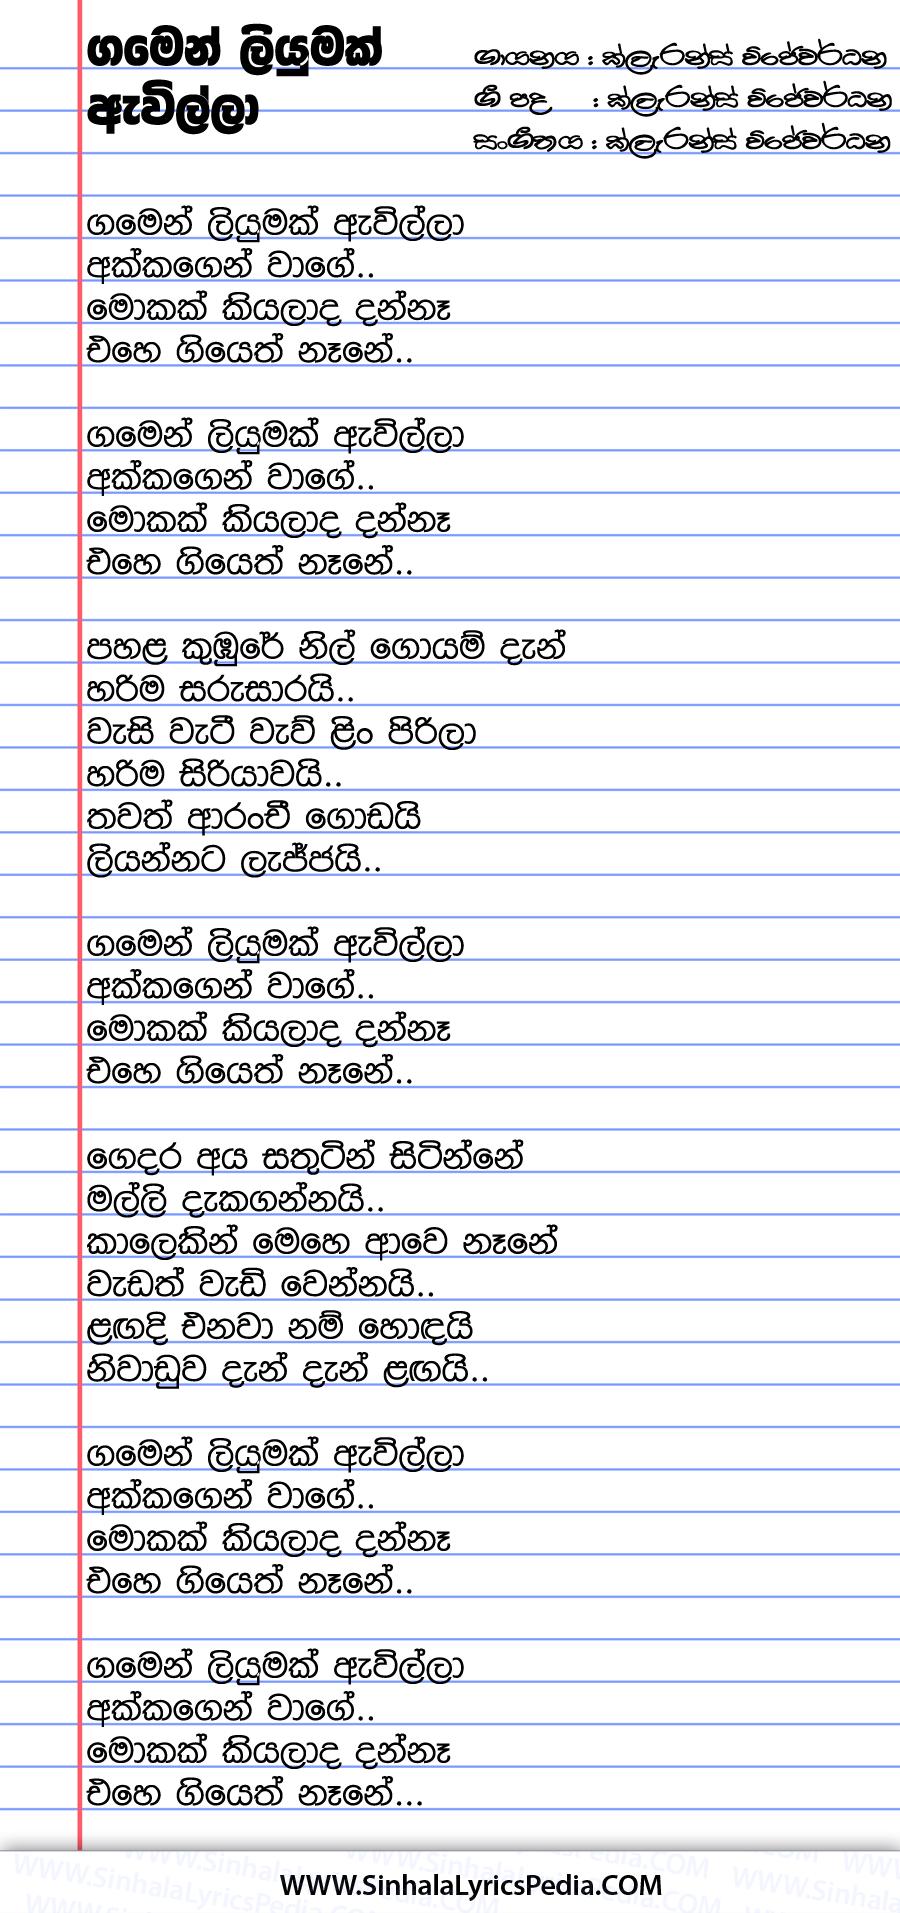 Gamen Liyumak Awilla Song Lyrics